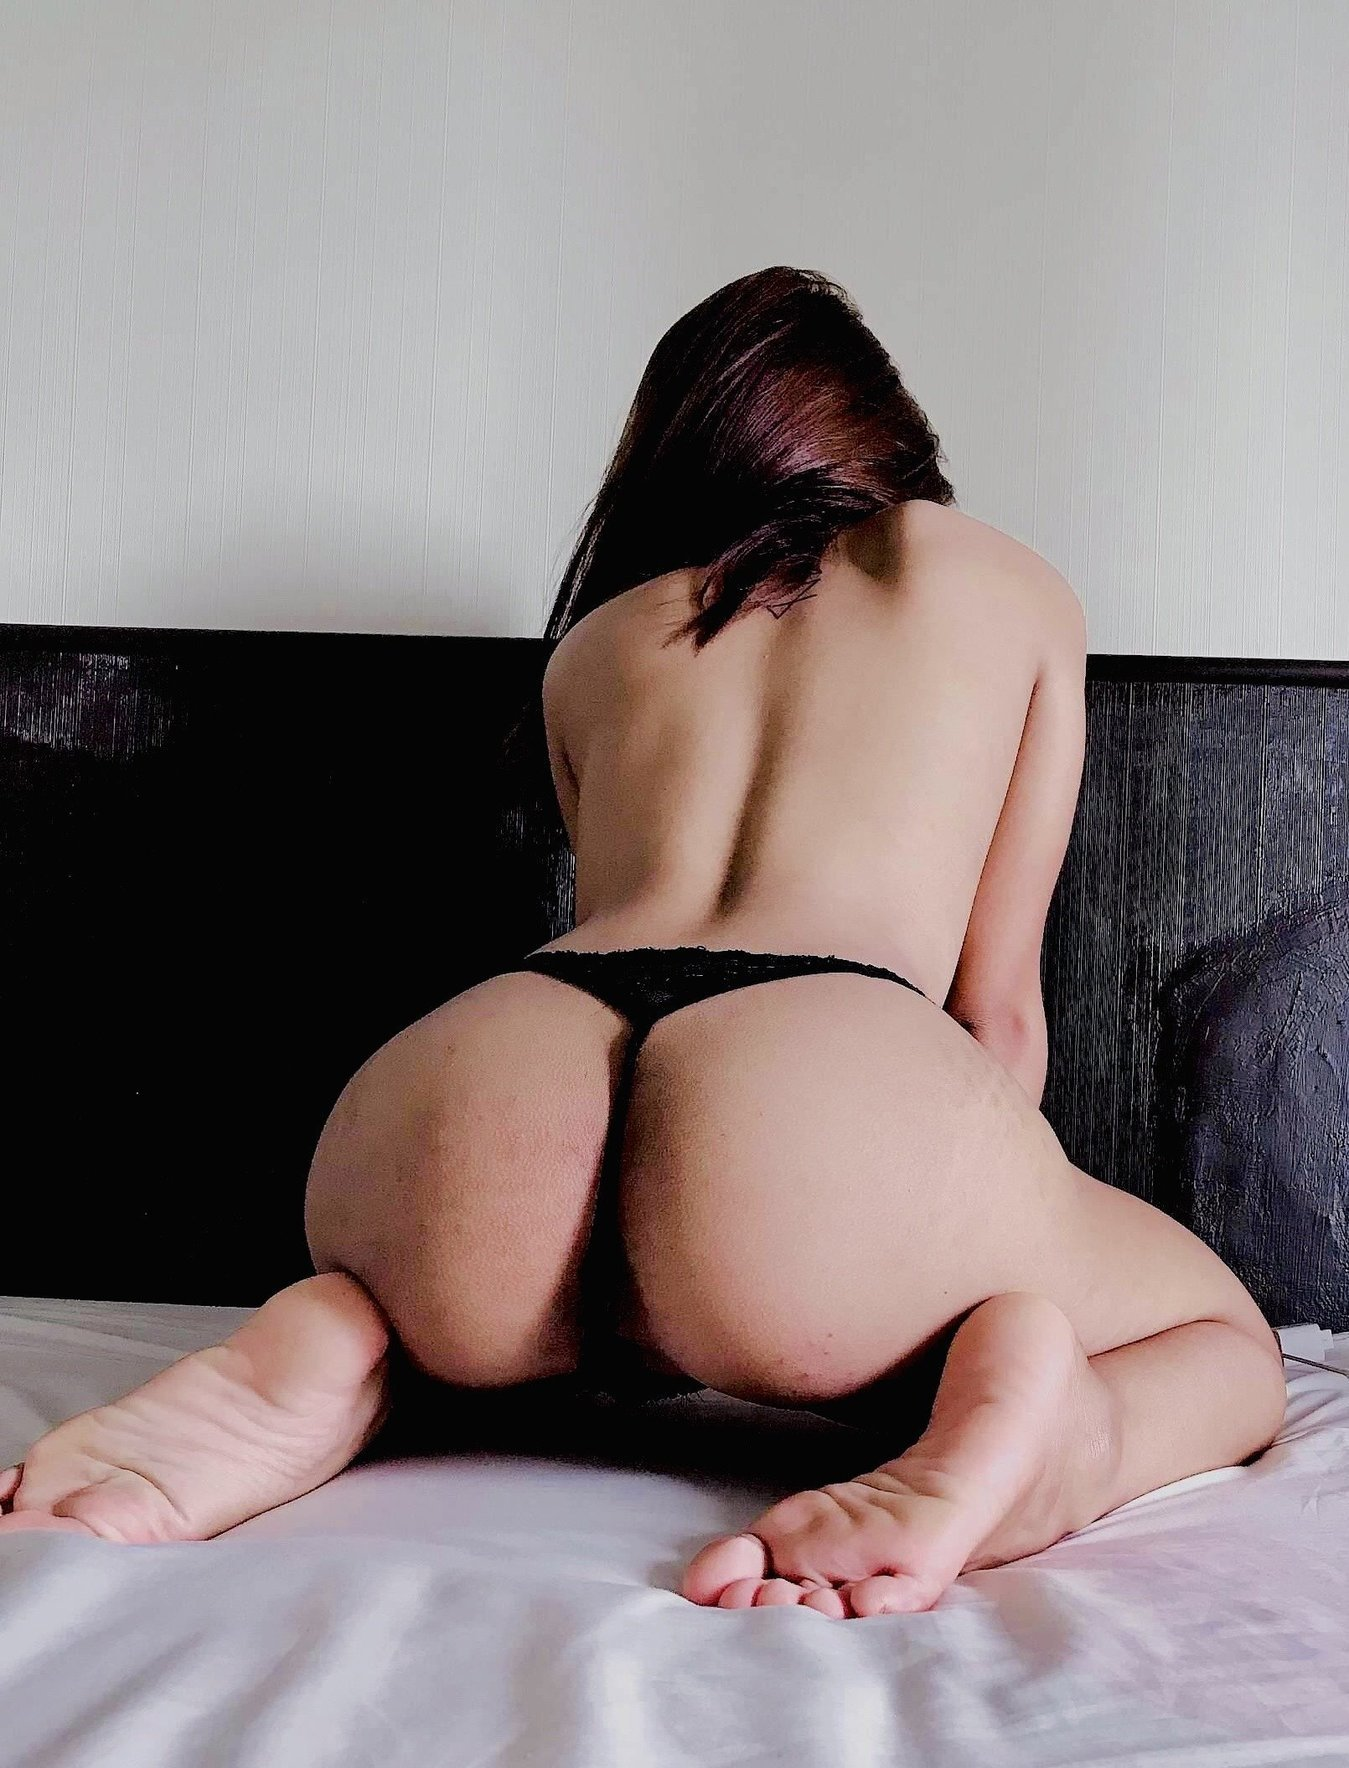 Chloe Choleboo Onlyfans Nude Leaks 0020